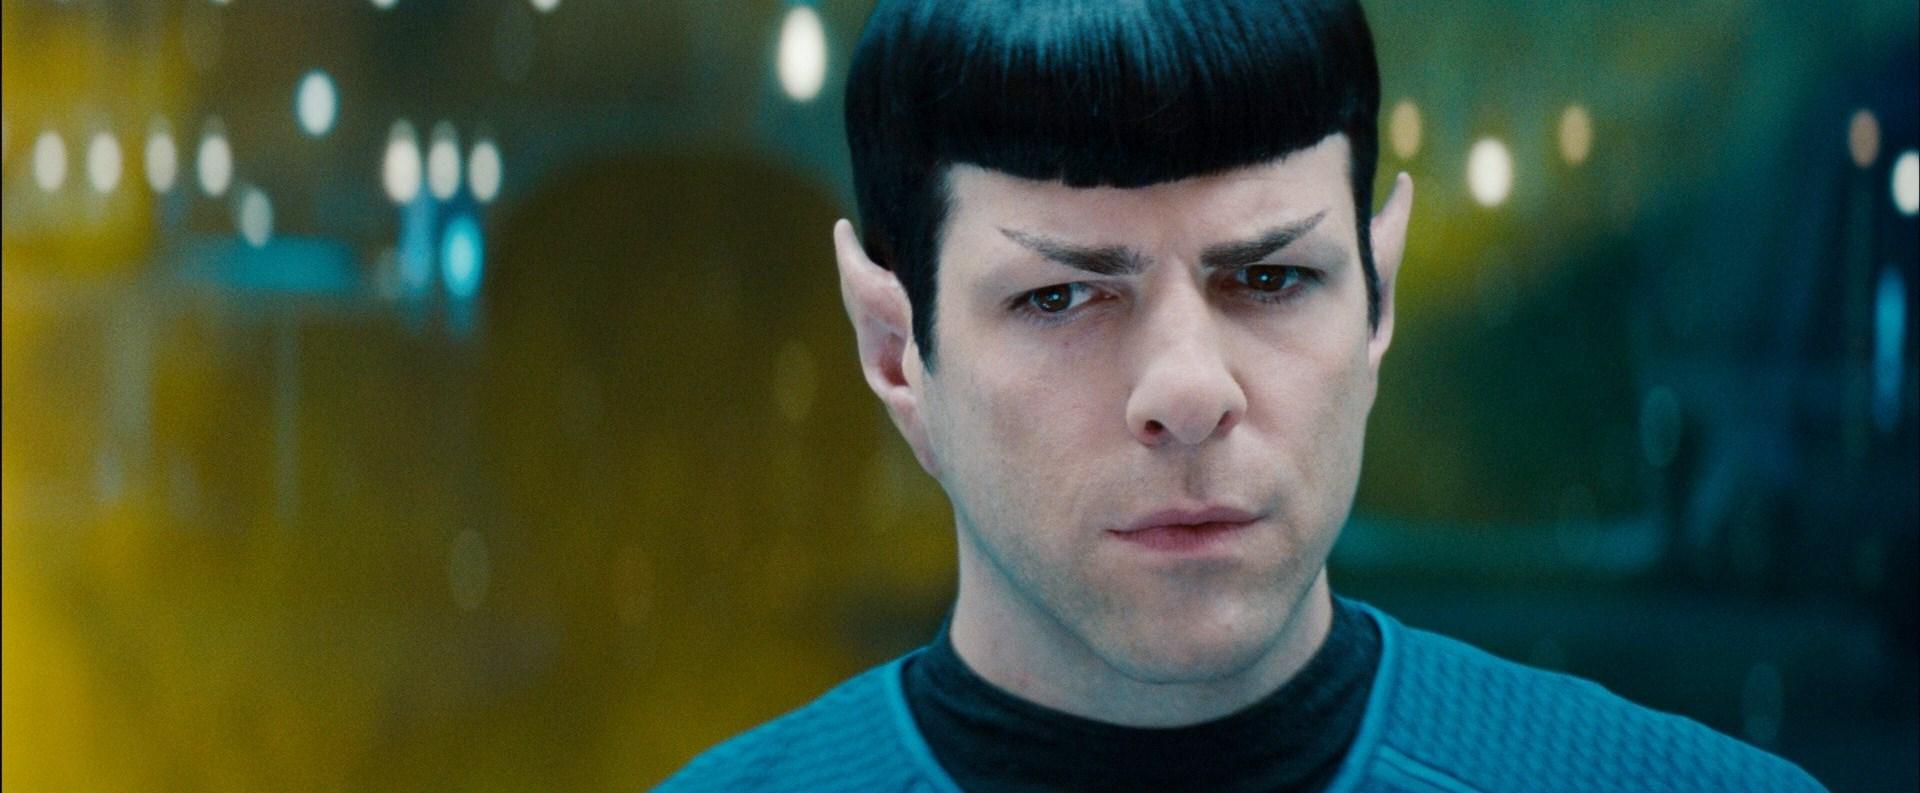 Star Trek into Darkness - Zachary Quinto's Spock Photo ...